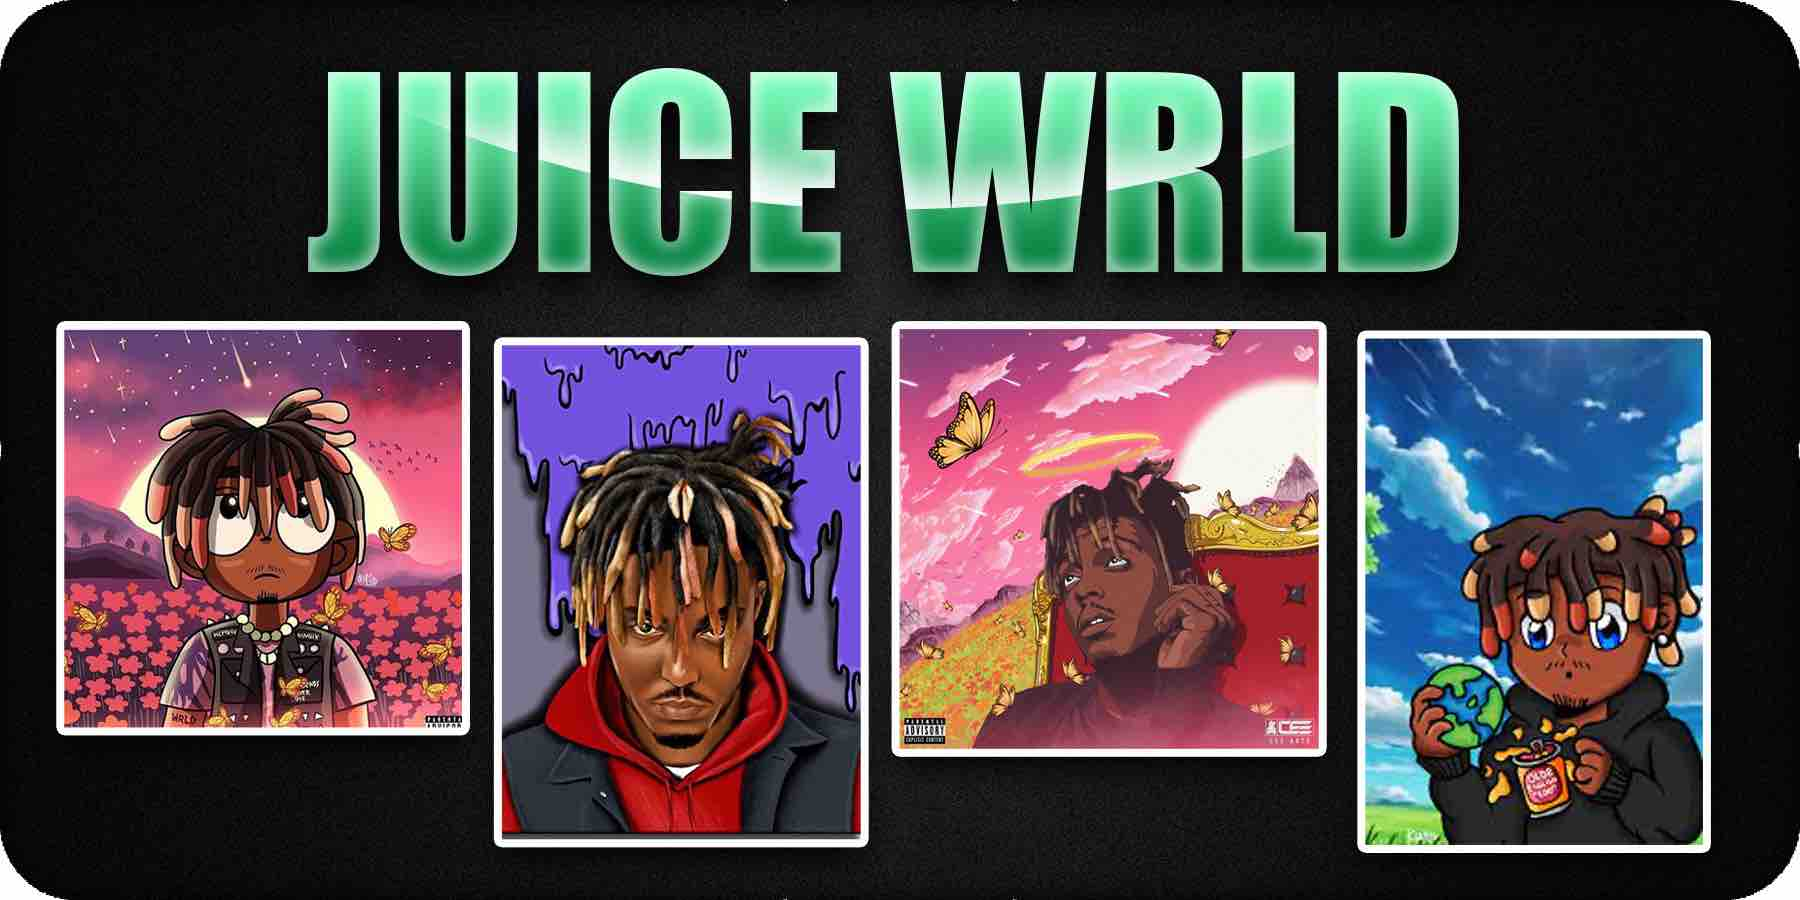 Juice Wrld Cartoon Cover Art